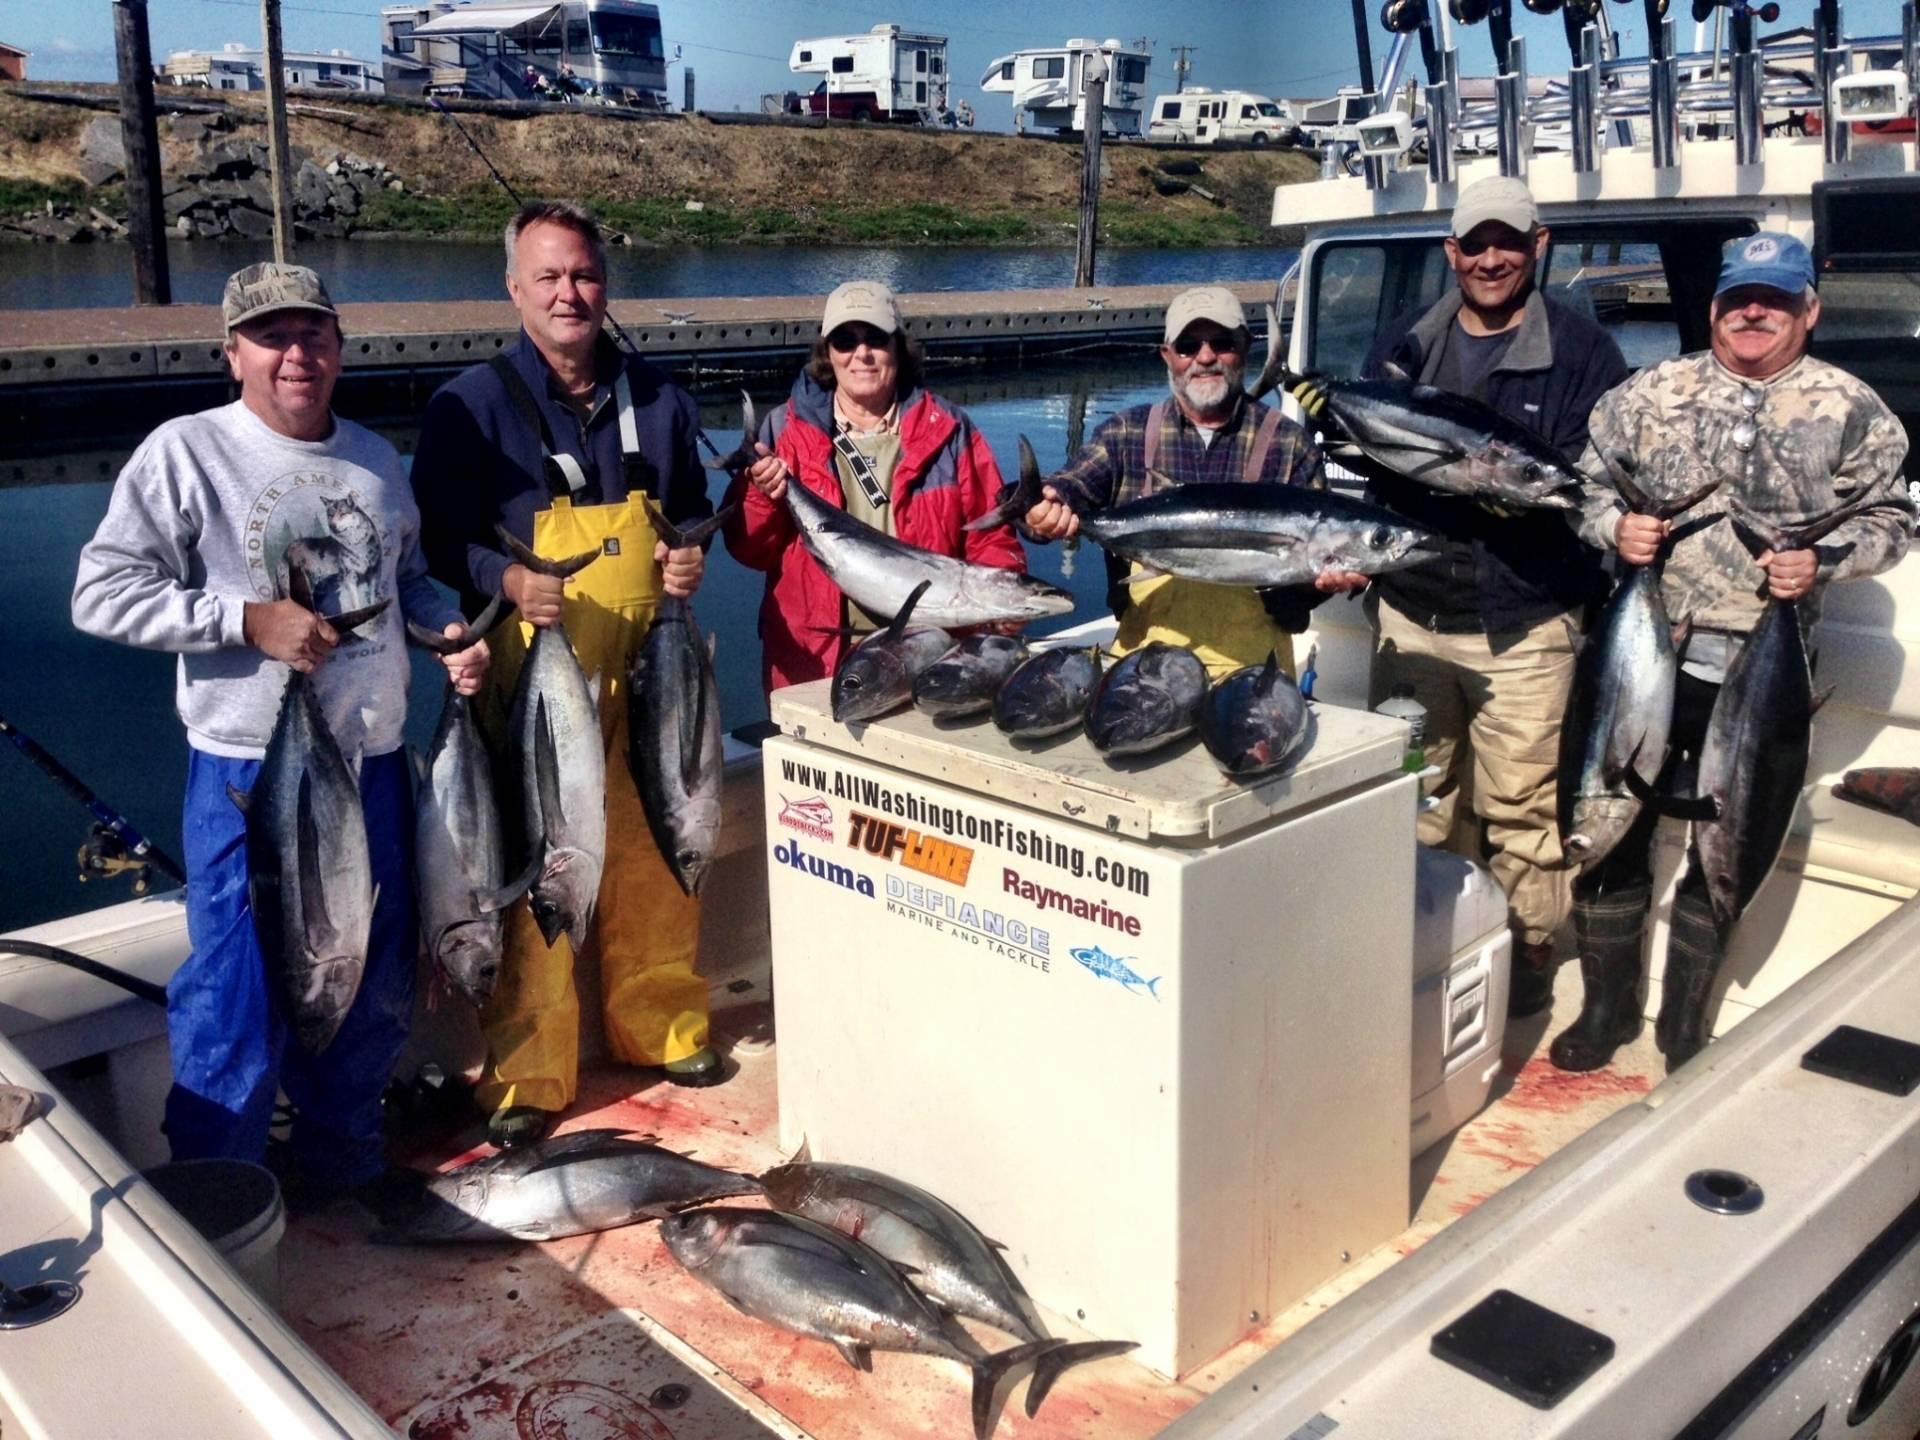 Team defiance arsc tuna salmon westport puget sound for Westport charters fishing report